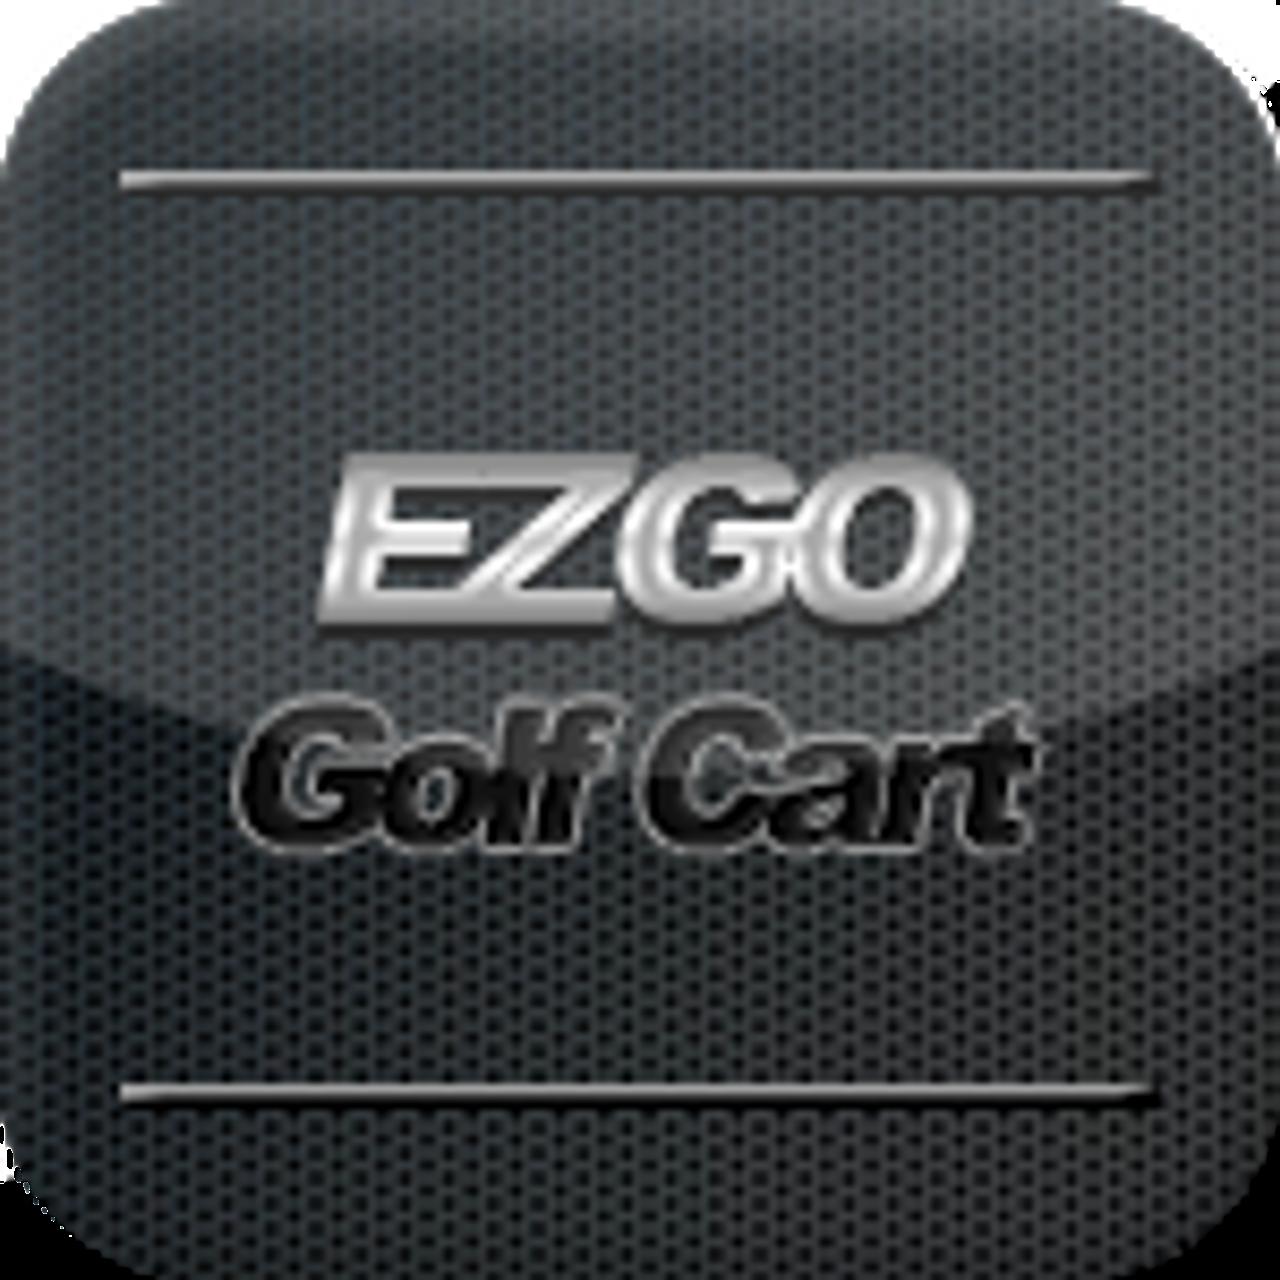 EZGO Electric Motors and Parts